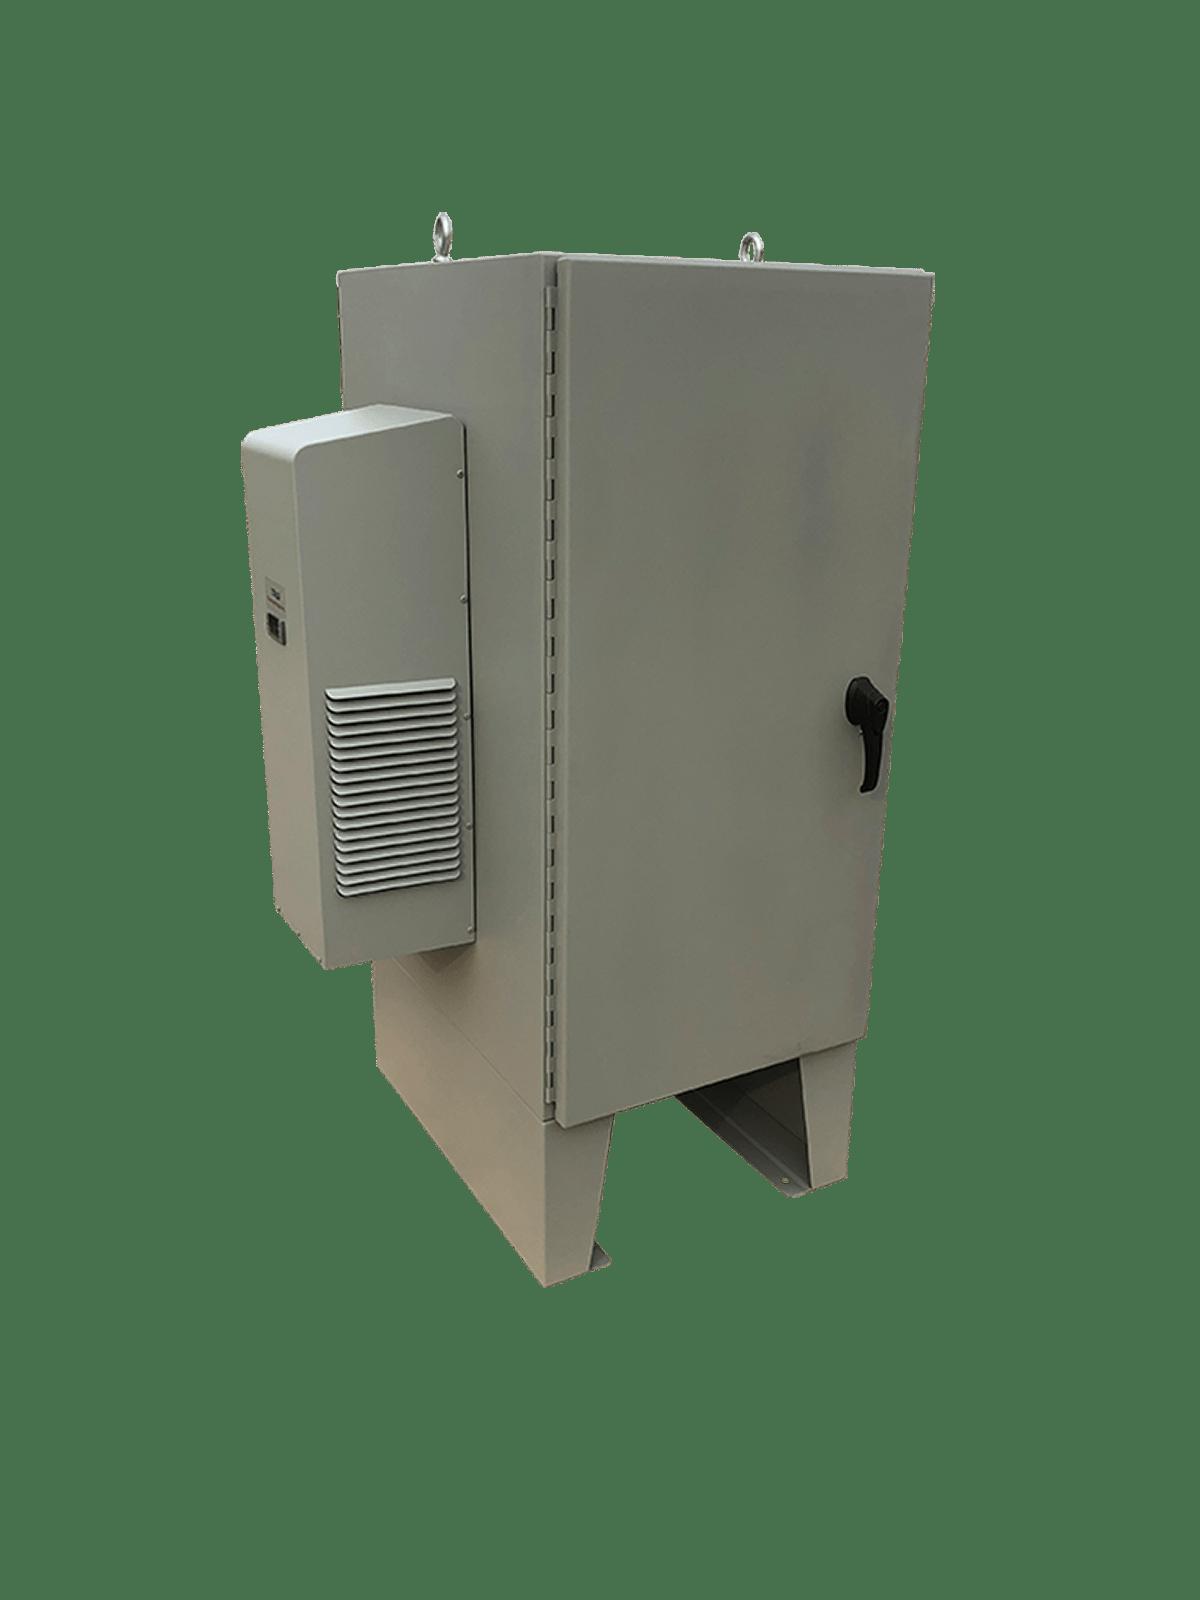 19 inch rackmount server enclosures